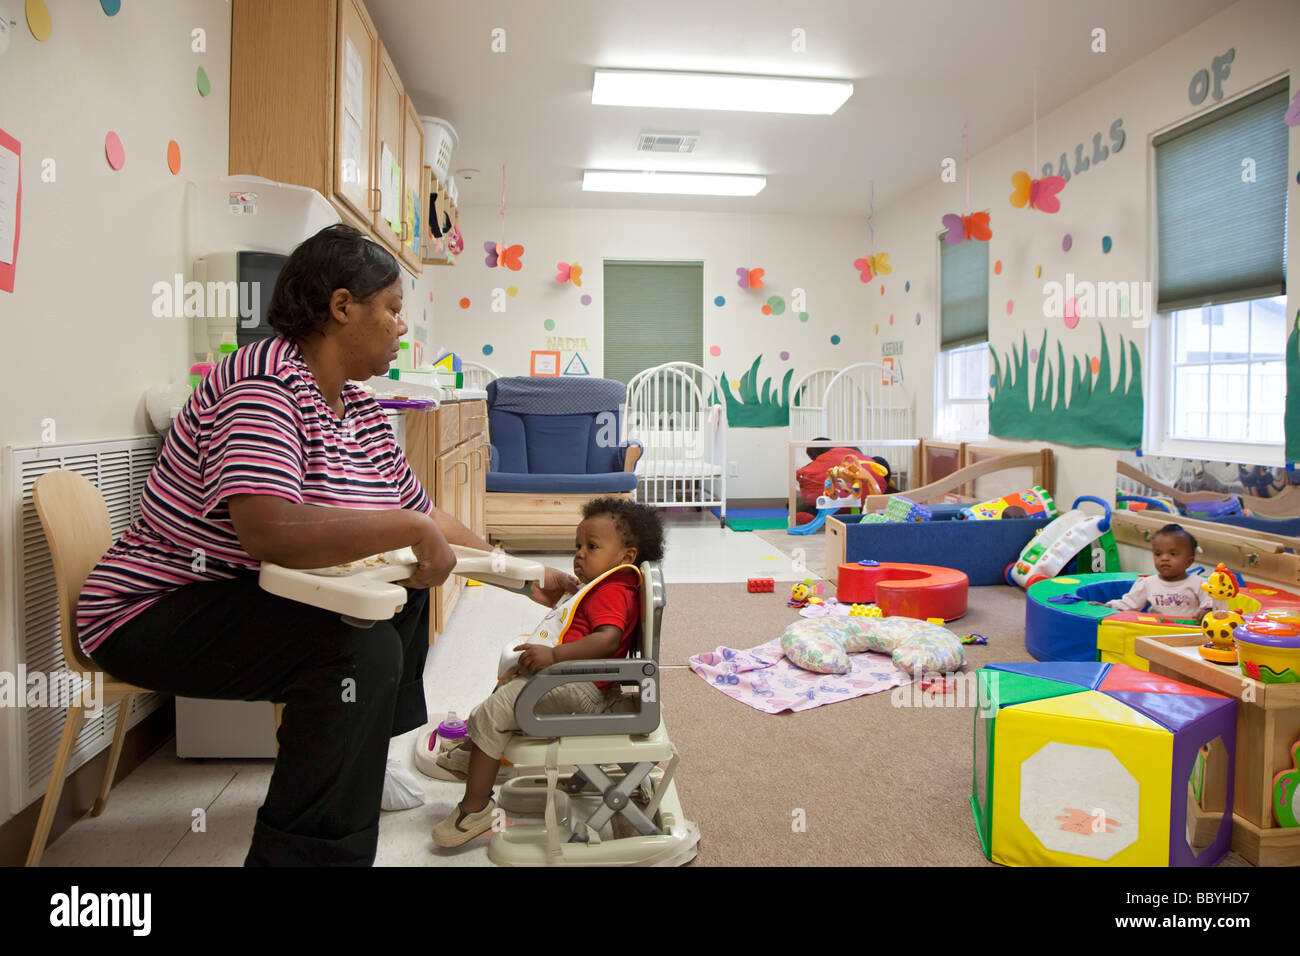 'child care' 'day care' childcare nursery - Stock Image